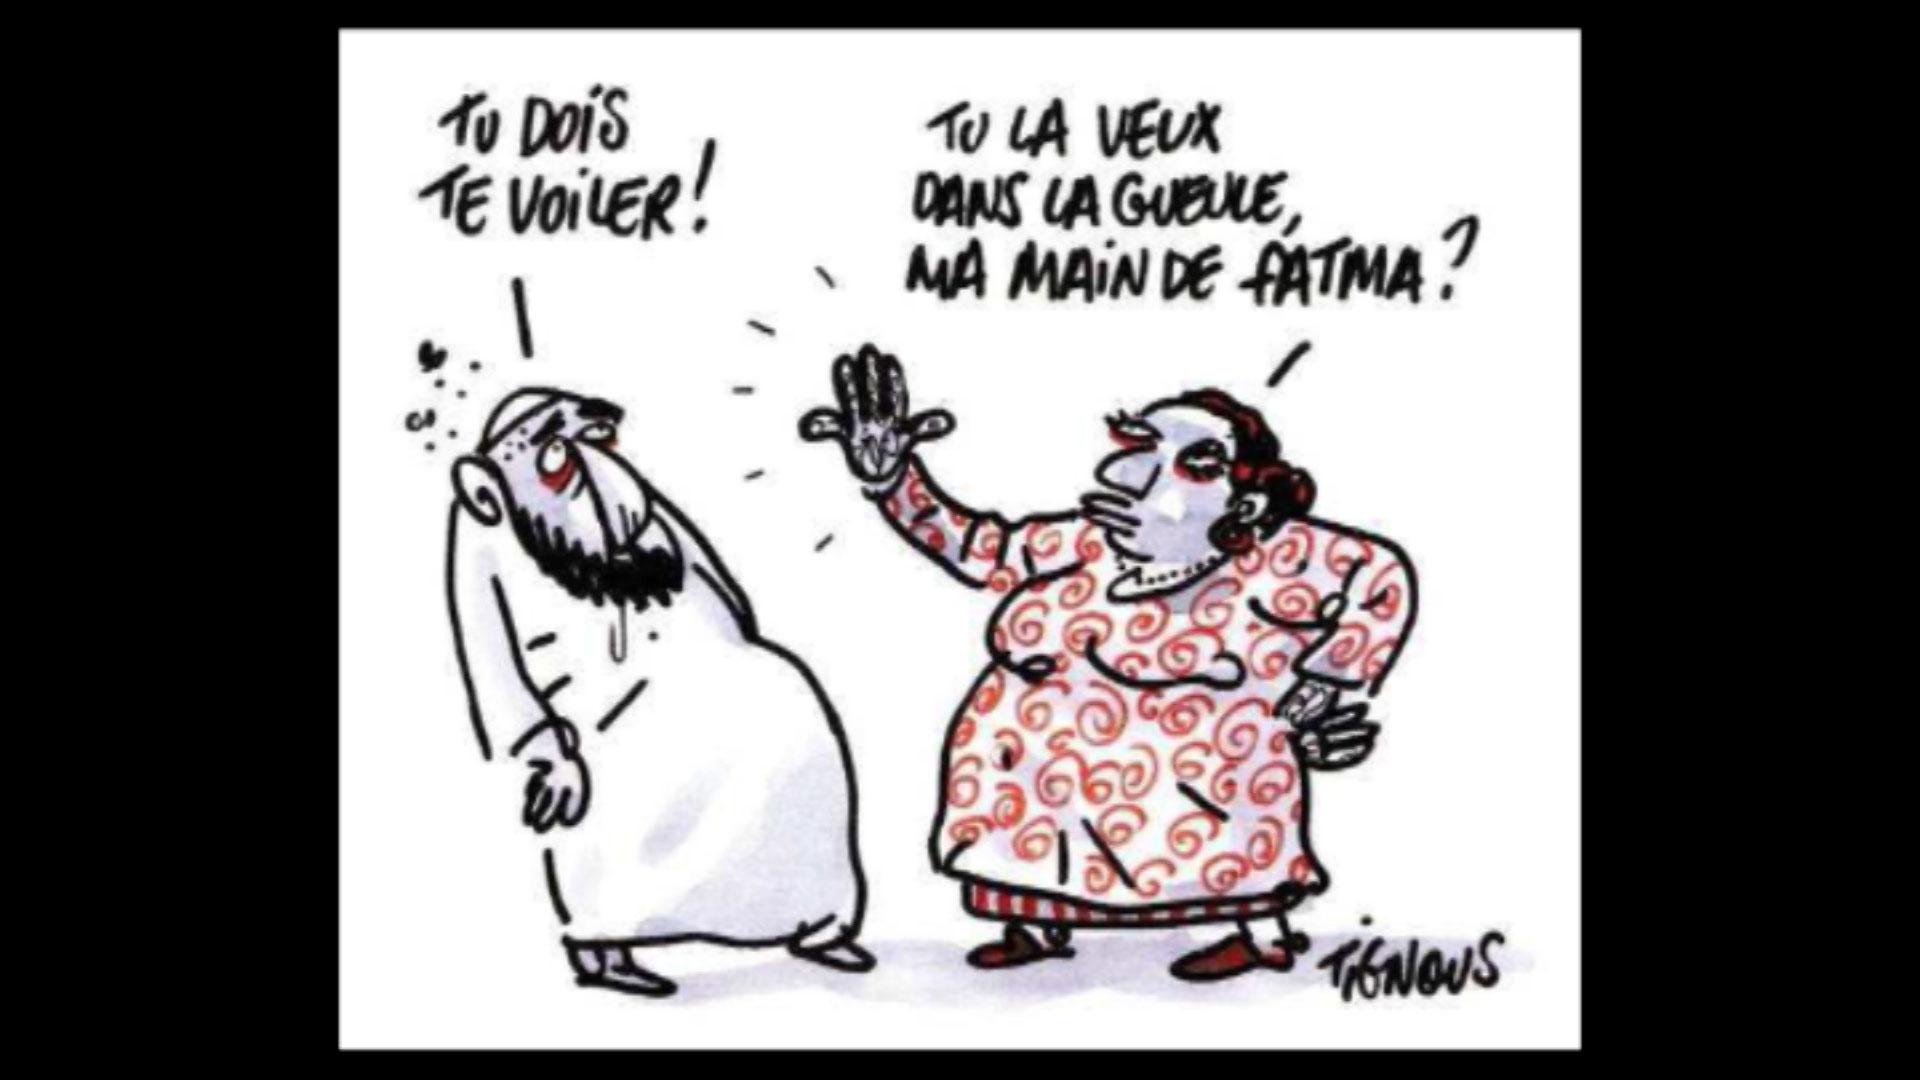 Chloé Verlhac